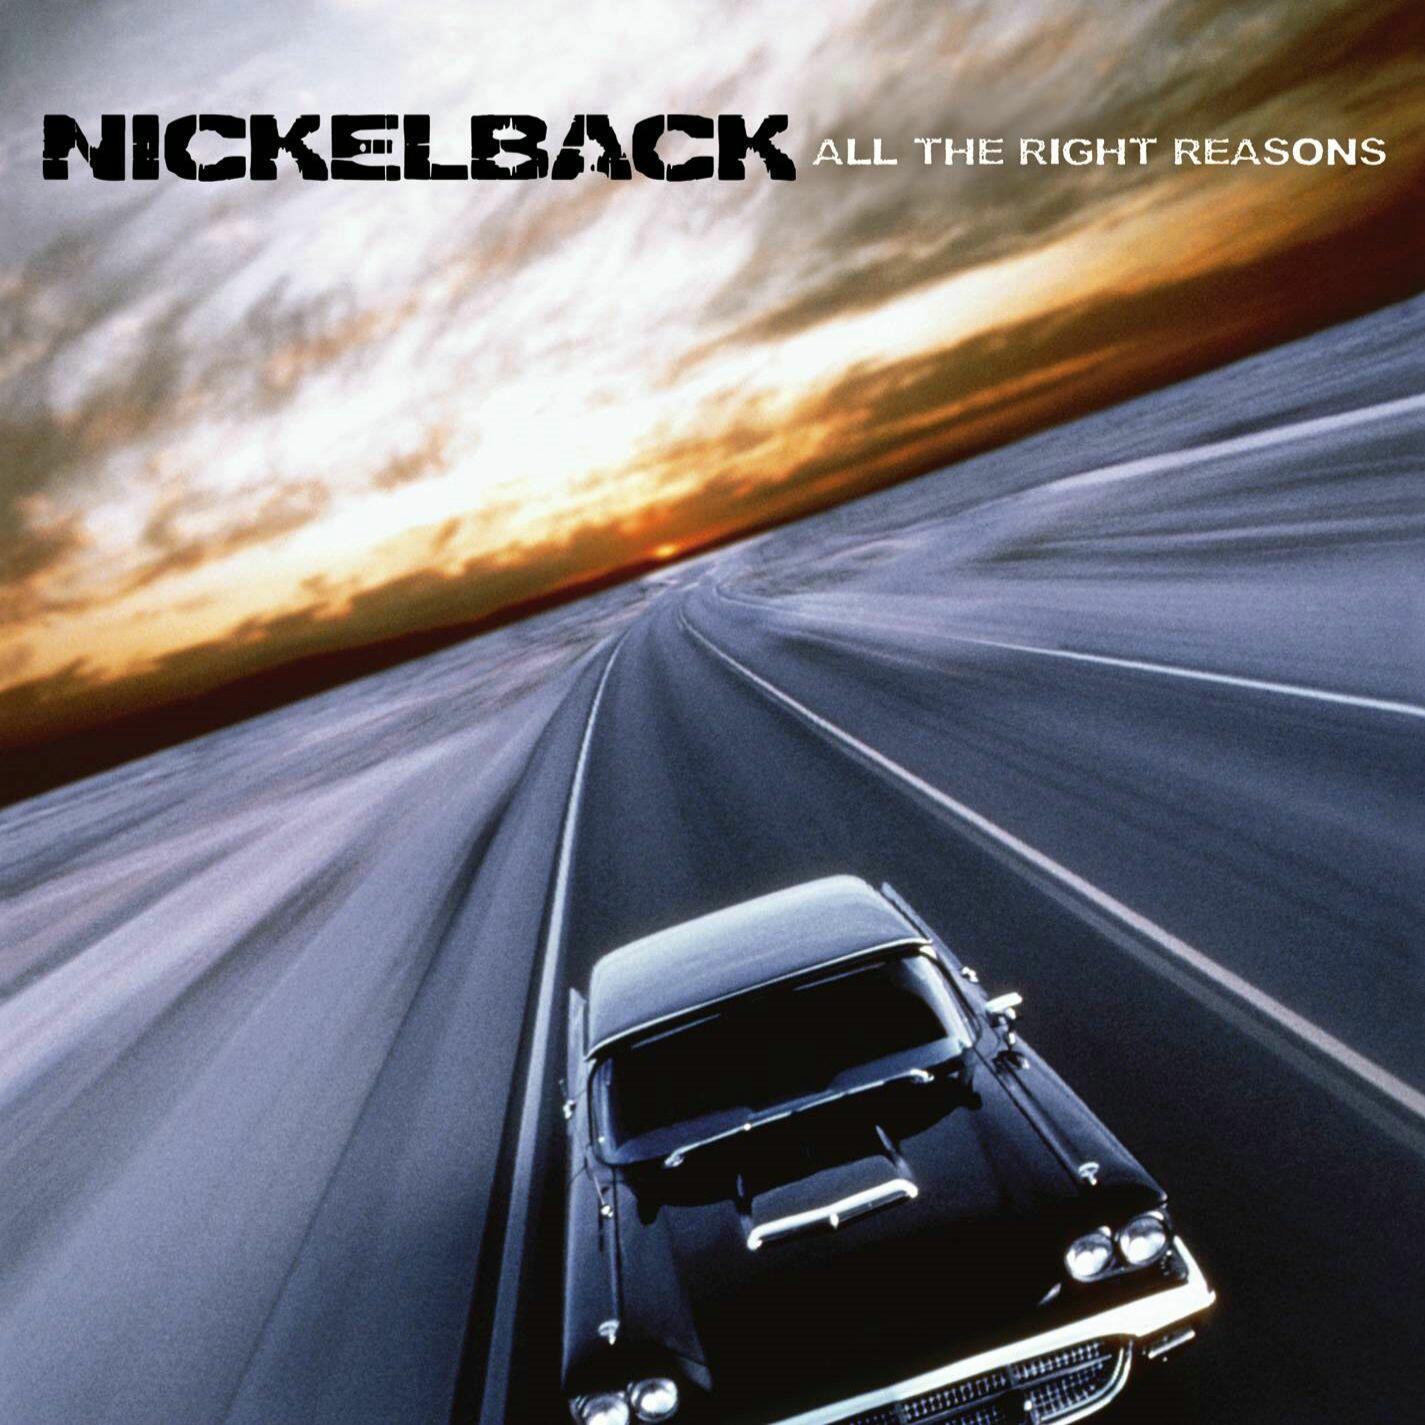 Away nickelback lyrics